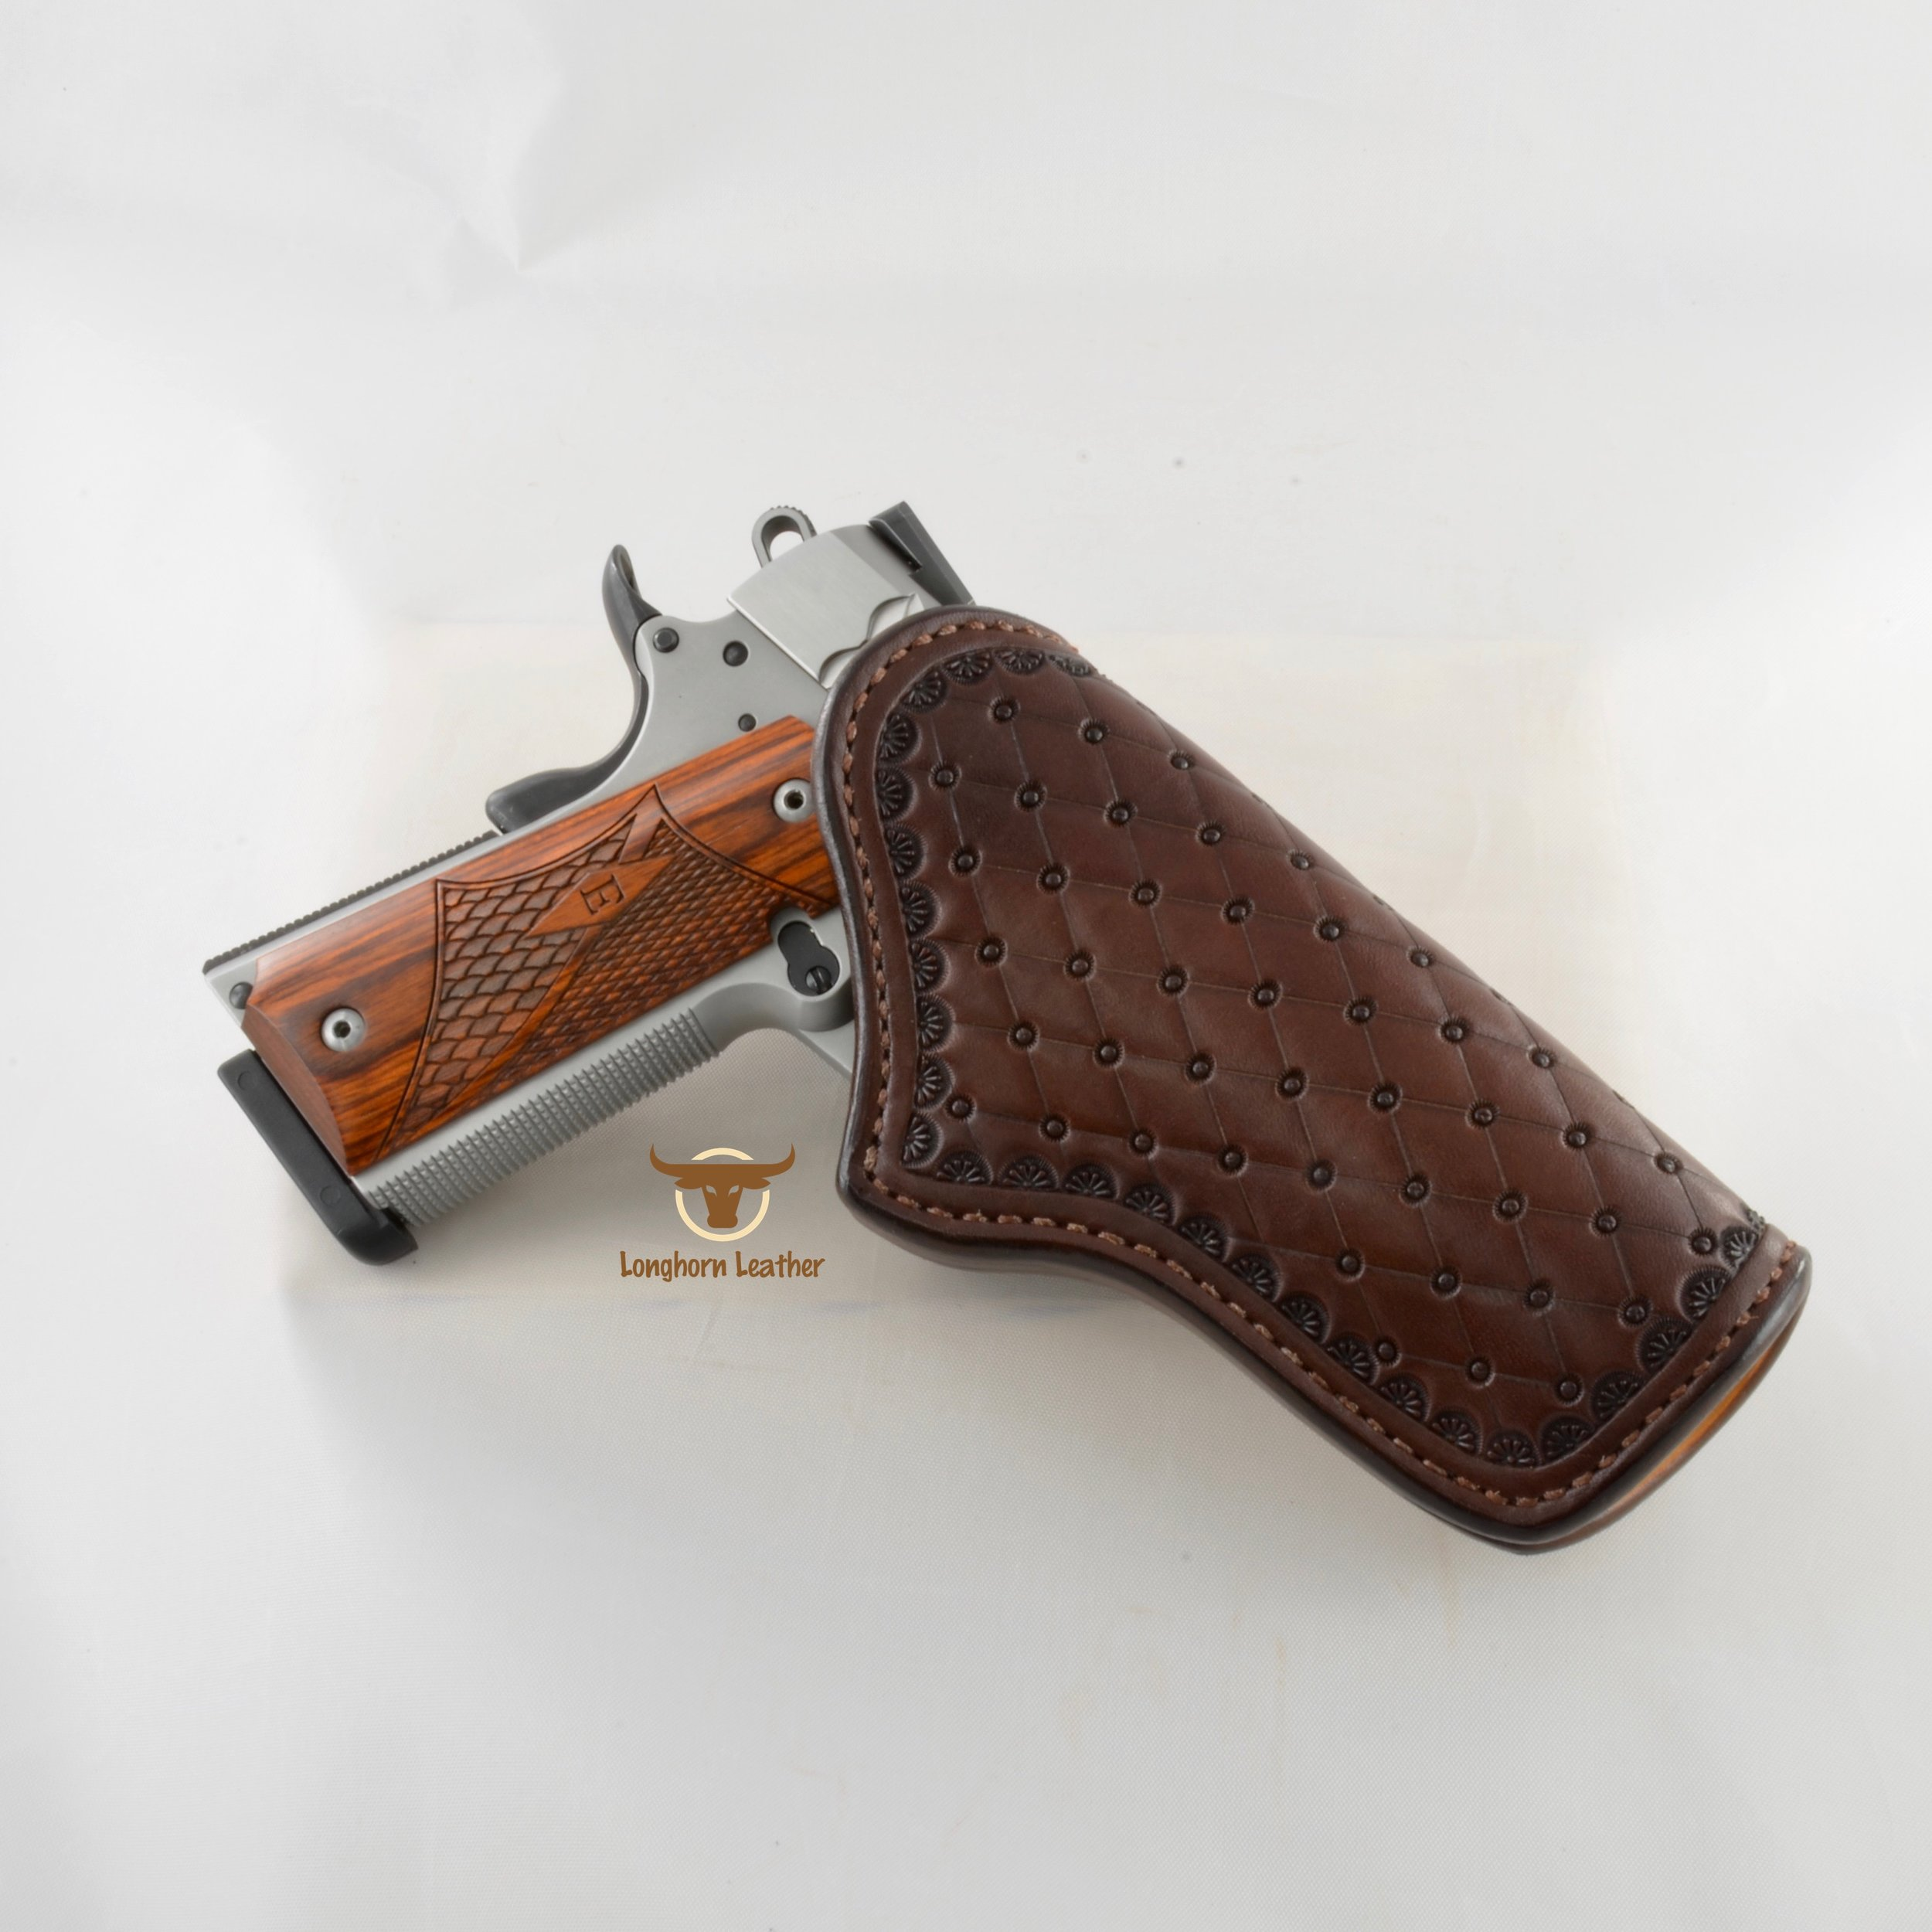 Longhorn Leather AZ - 1911 Holster featurng the %22San Carlos%22 design 2 2.jpg